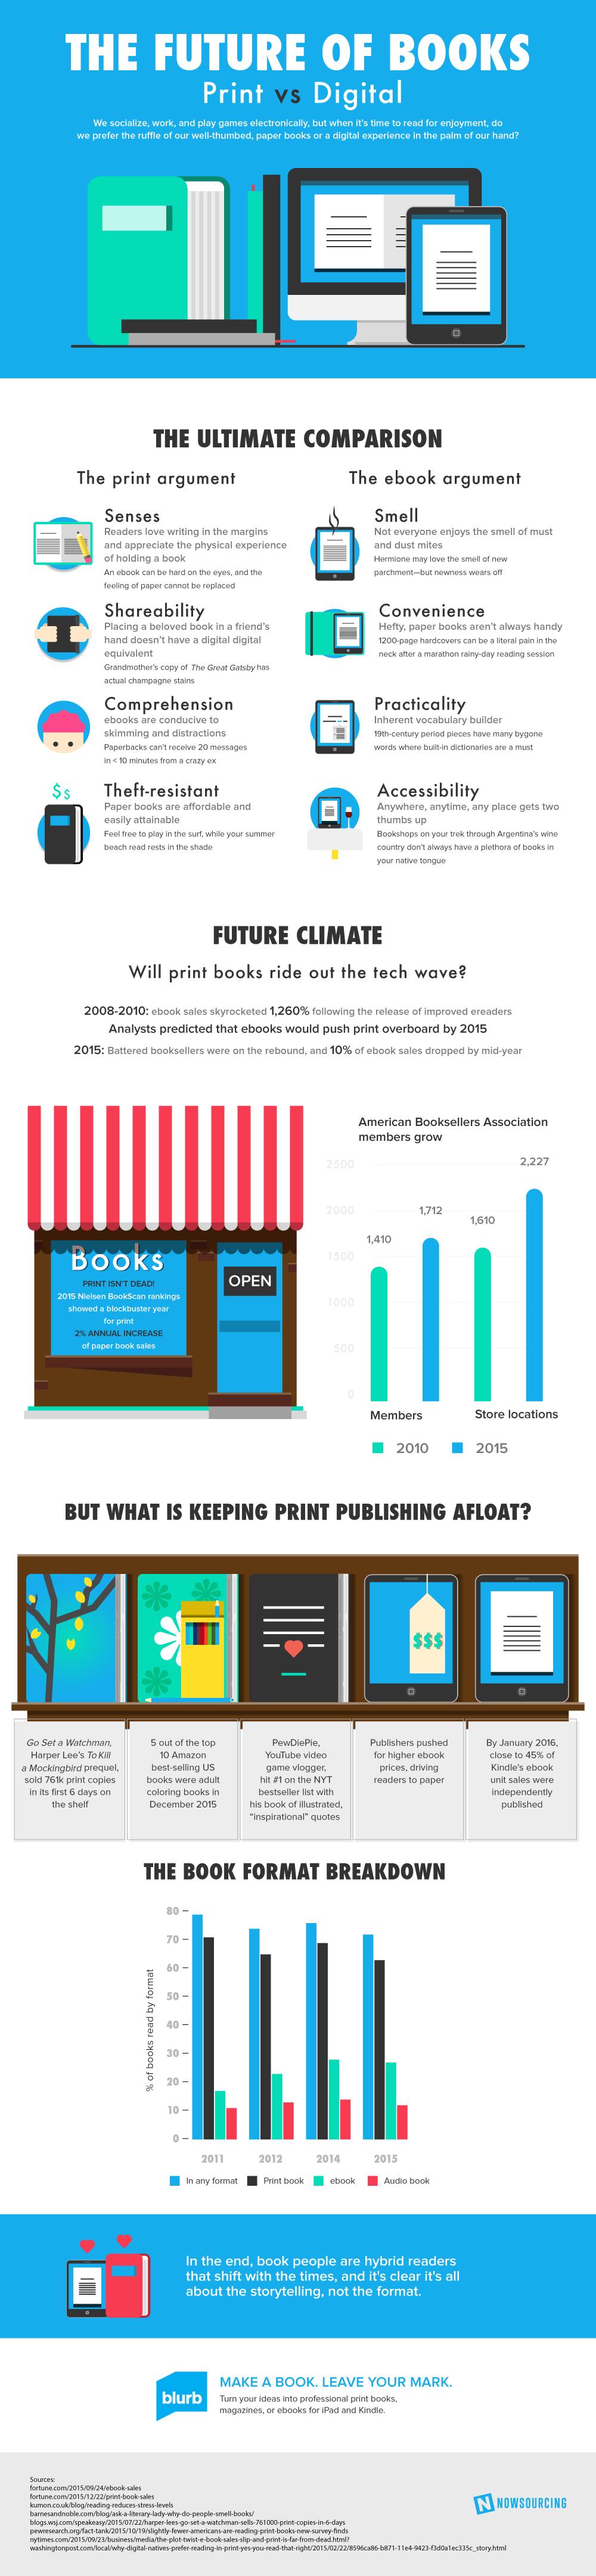 The Future of Books - Print Vs Digital